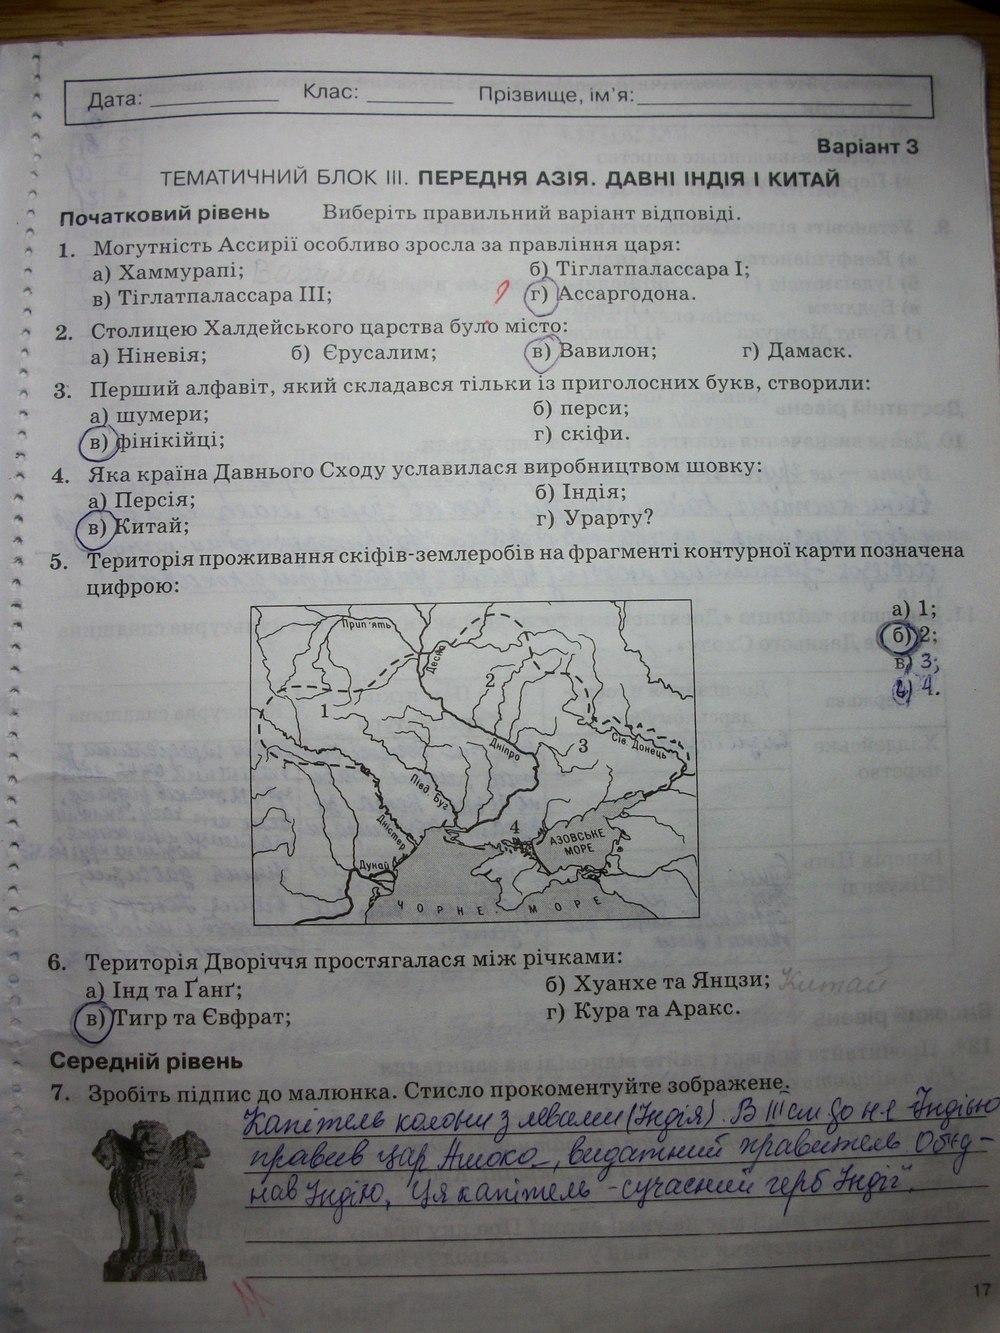 ГДЗ рабочие тетради 6 класс. Задание: стр. 17